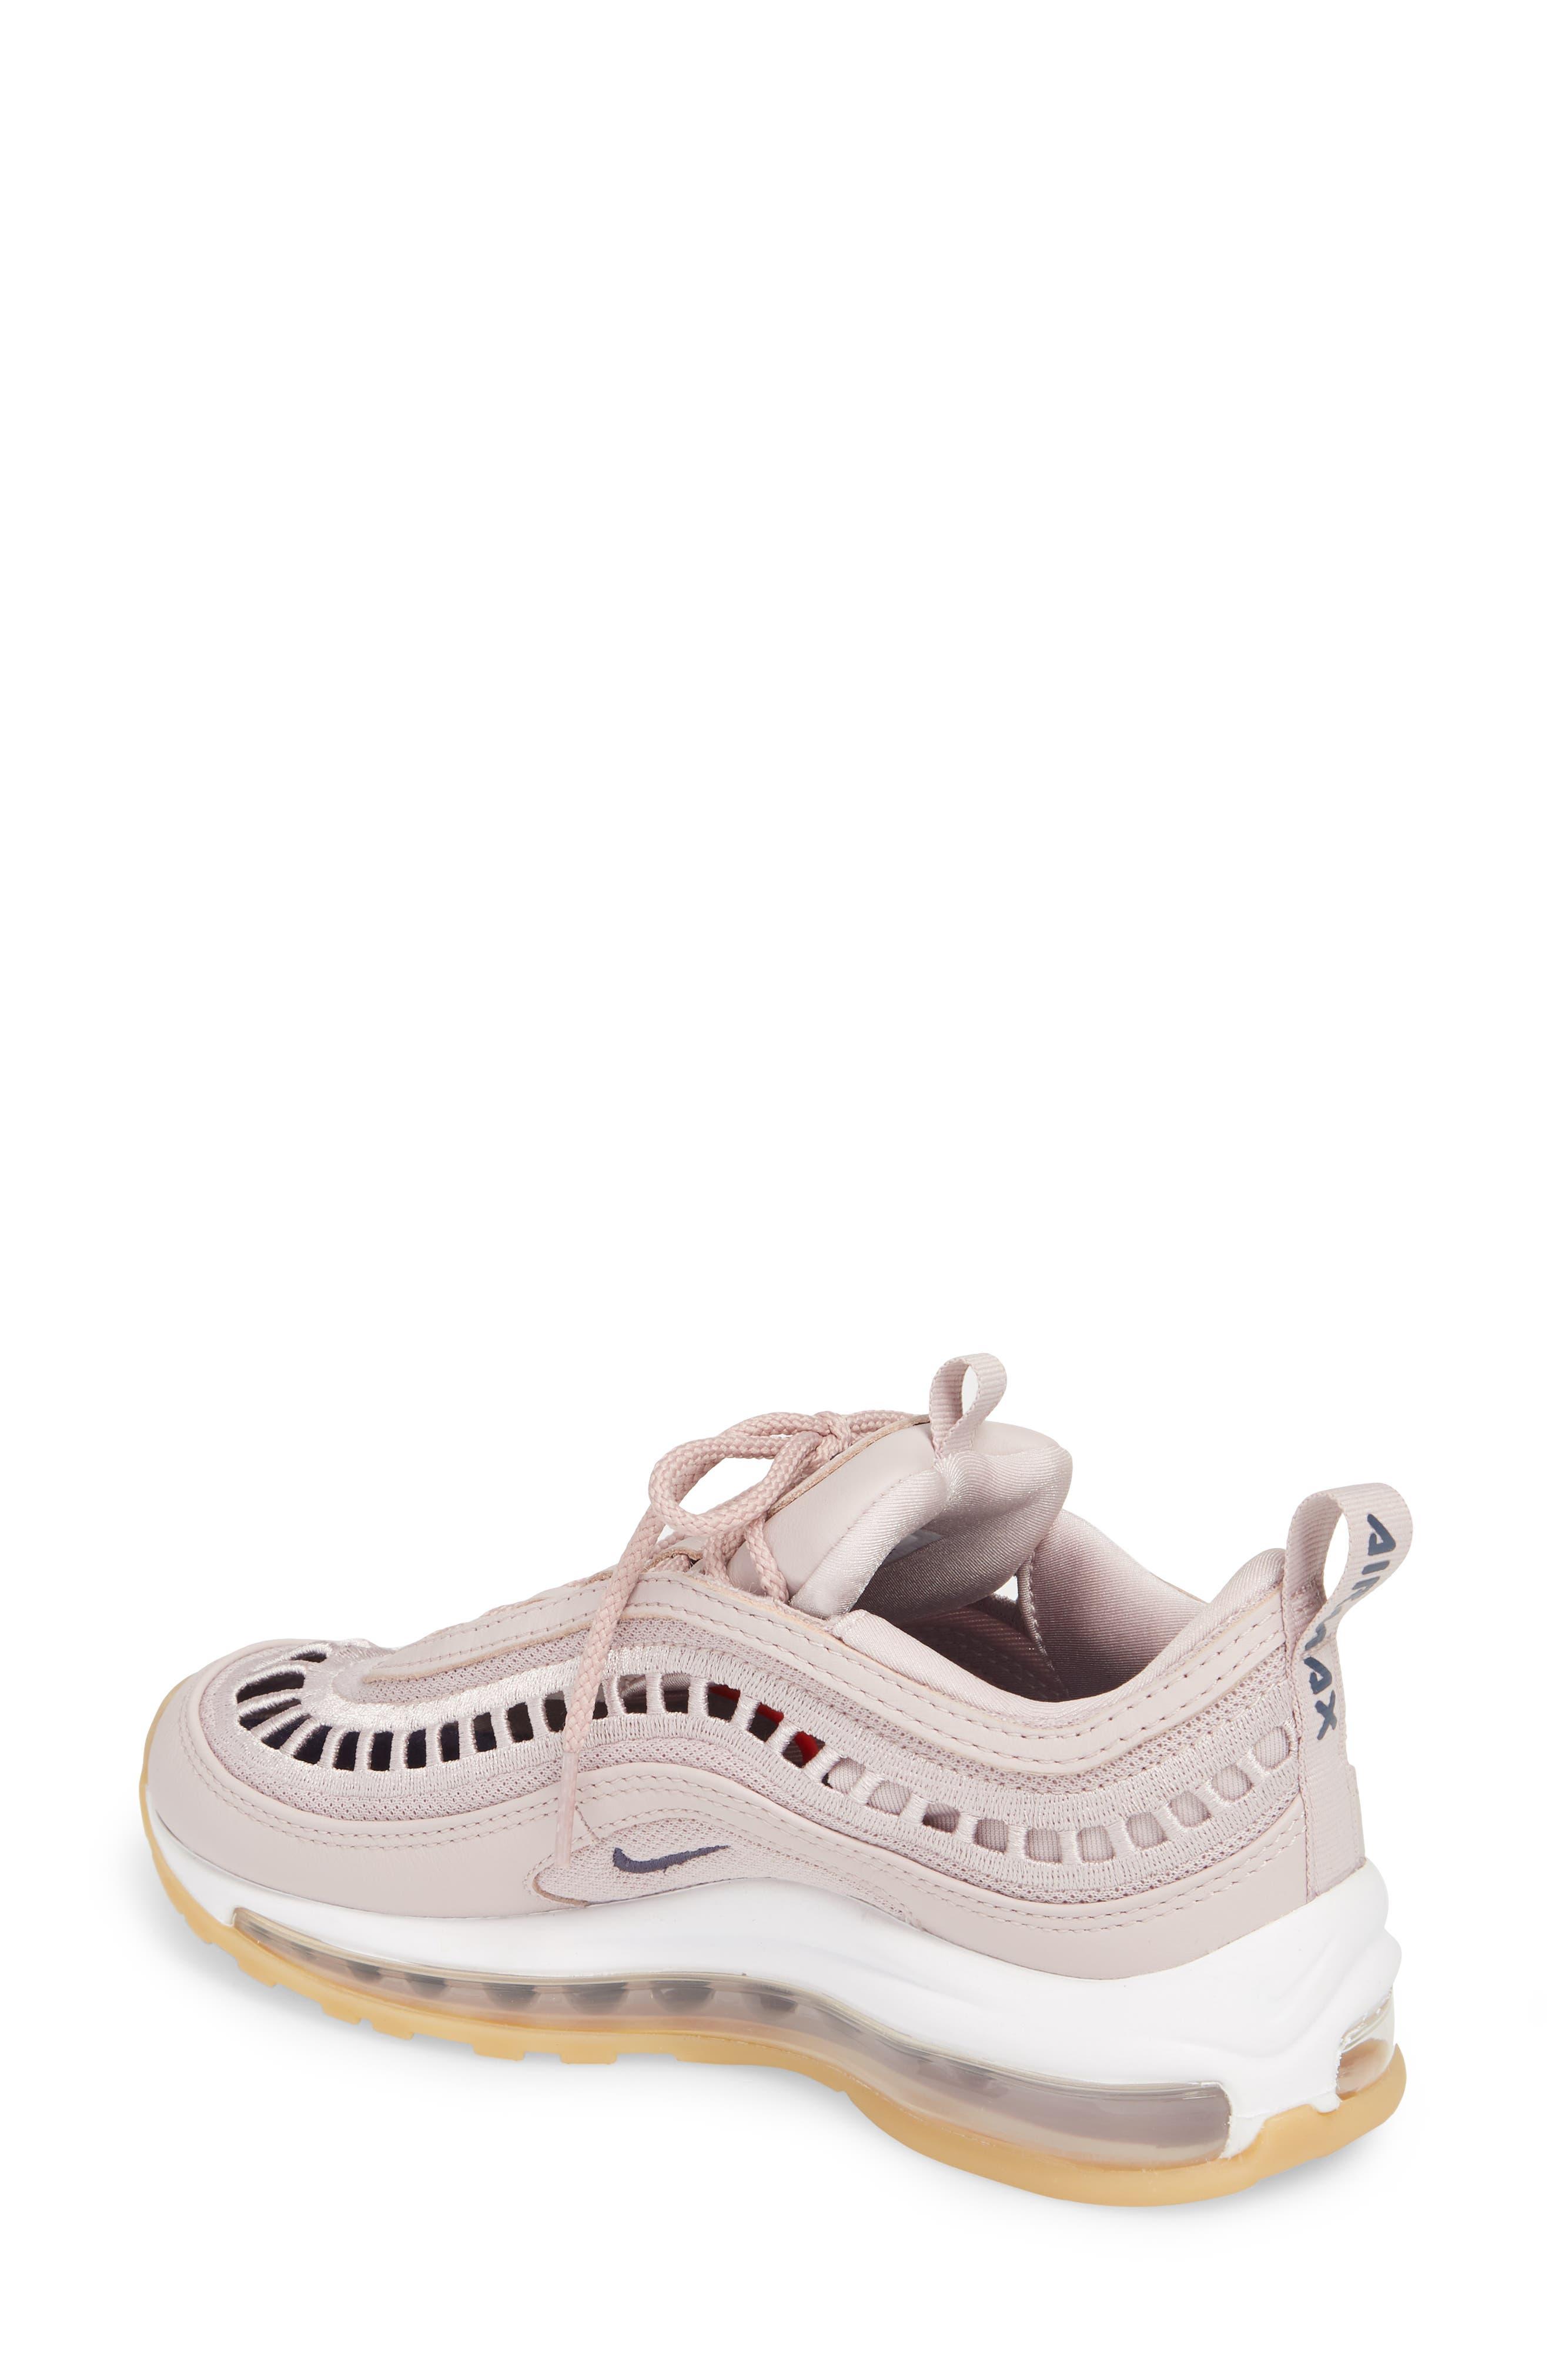 Air Max 97 Ultra '17 SI Sneaker,                             Alternate thumbnail 2, color,                             Particle Rose/ Neutral Indigo